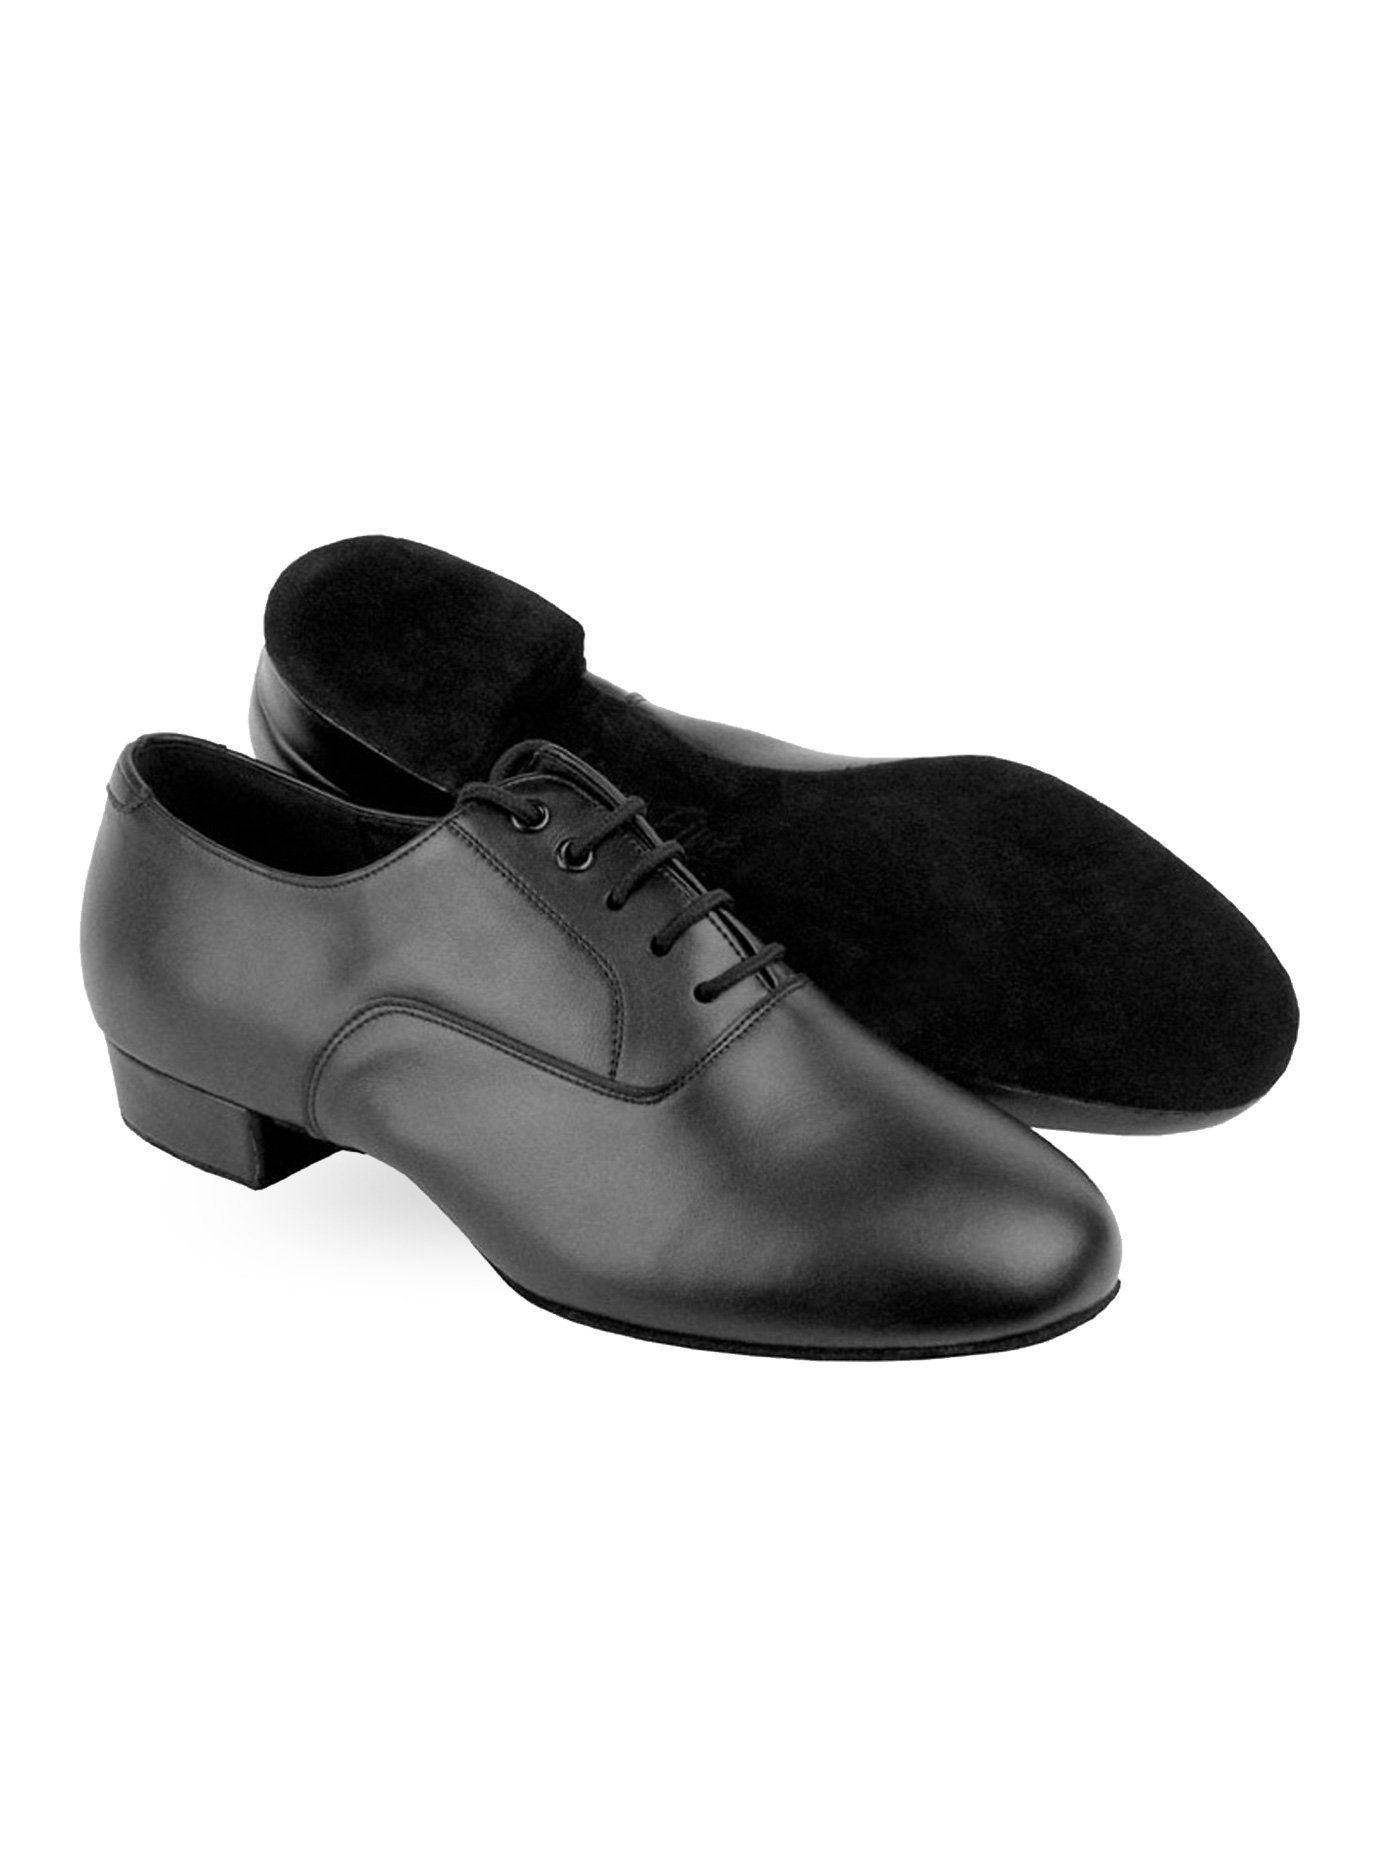 Mens Standard-C Series Wide Width Ballroom Shoes,C919101WBL10095,Black Leather,9.5